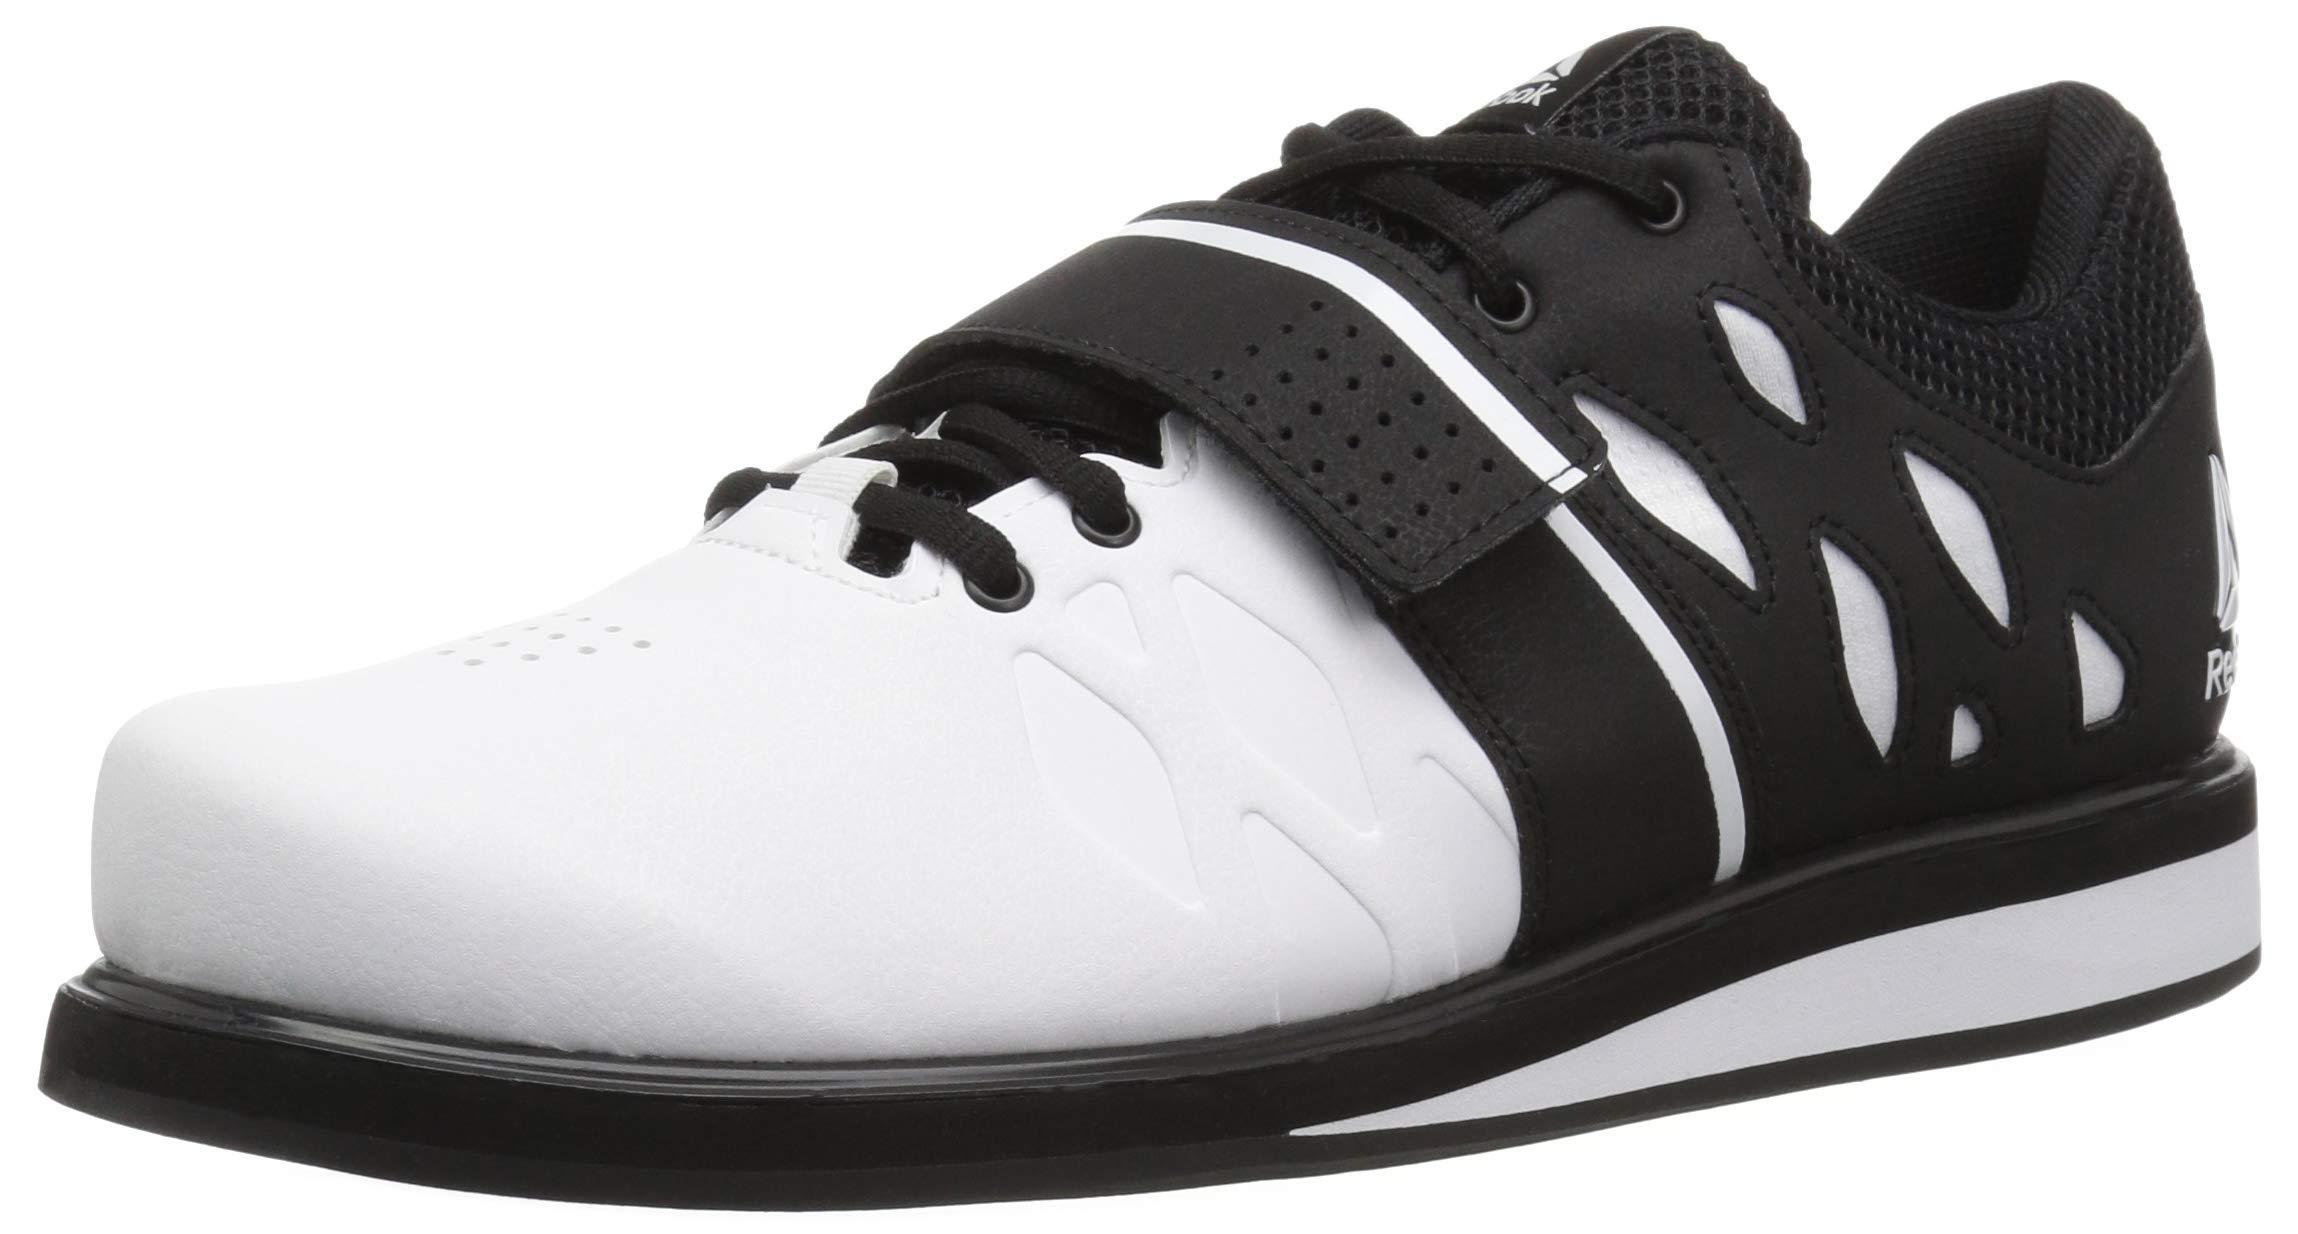 Reebok Men's Lifter Pr Cross Trainer, White/Black, 6.5 M US